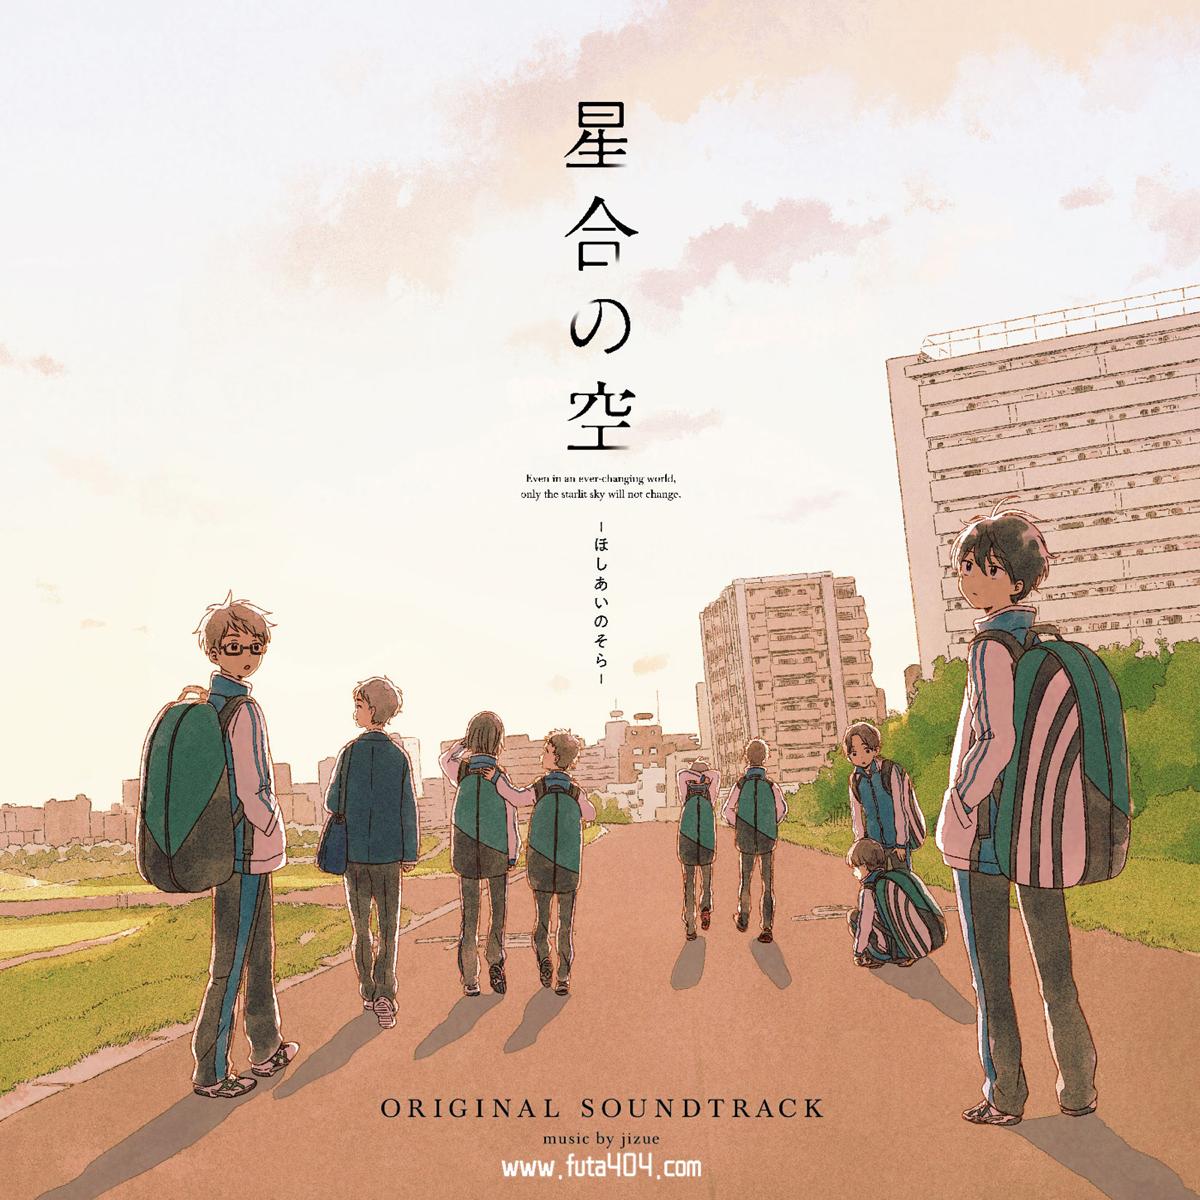 星合之空OST专辑下载 flying DOG 动漫音乐 第1张